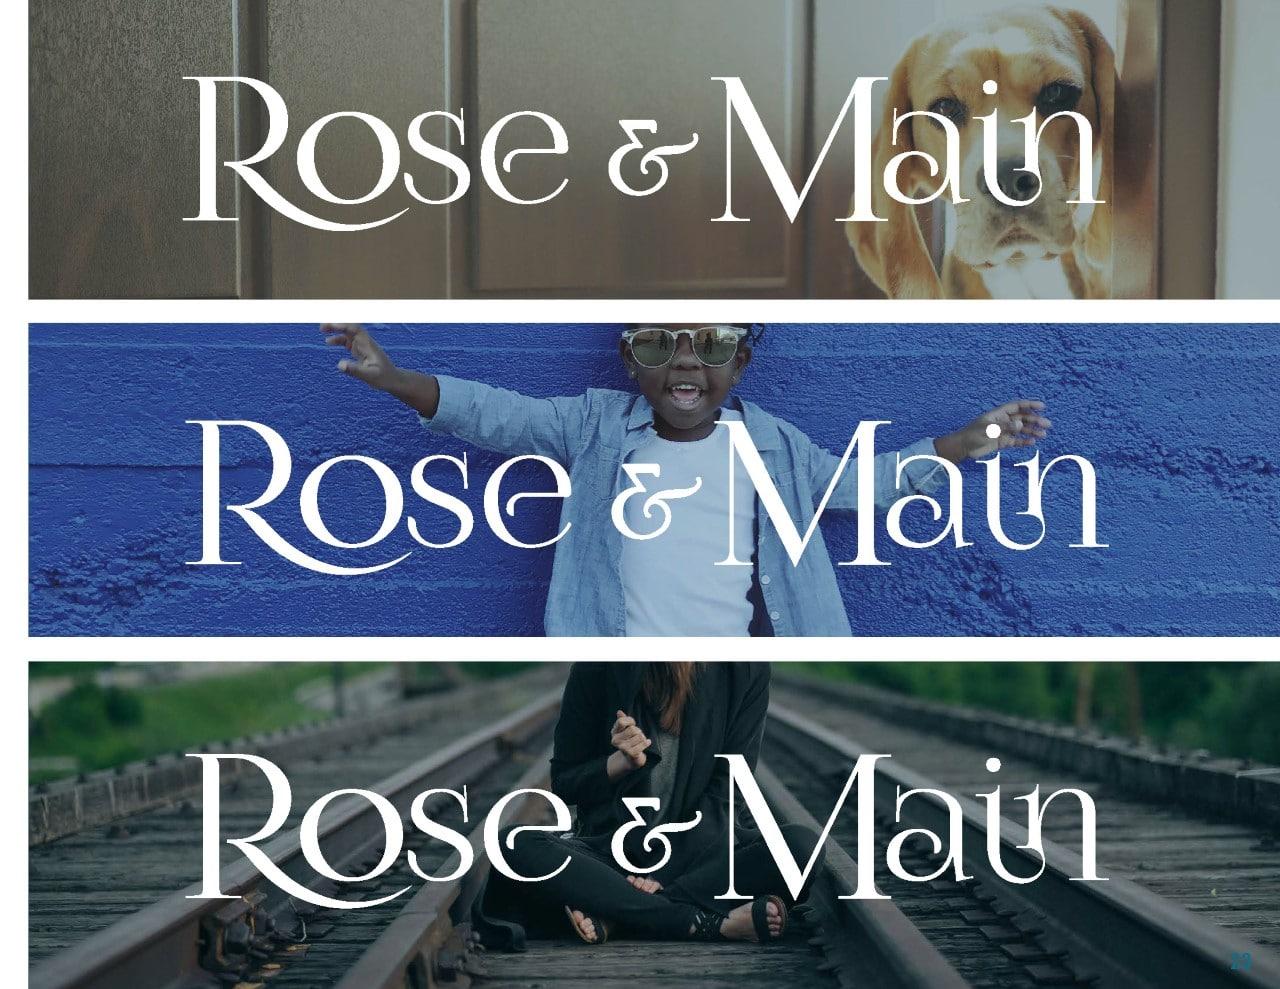 Rose & Main Brand Standards - Place Based Branding Logo Usage